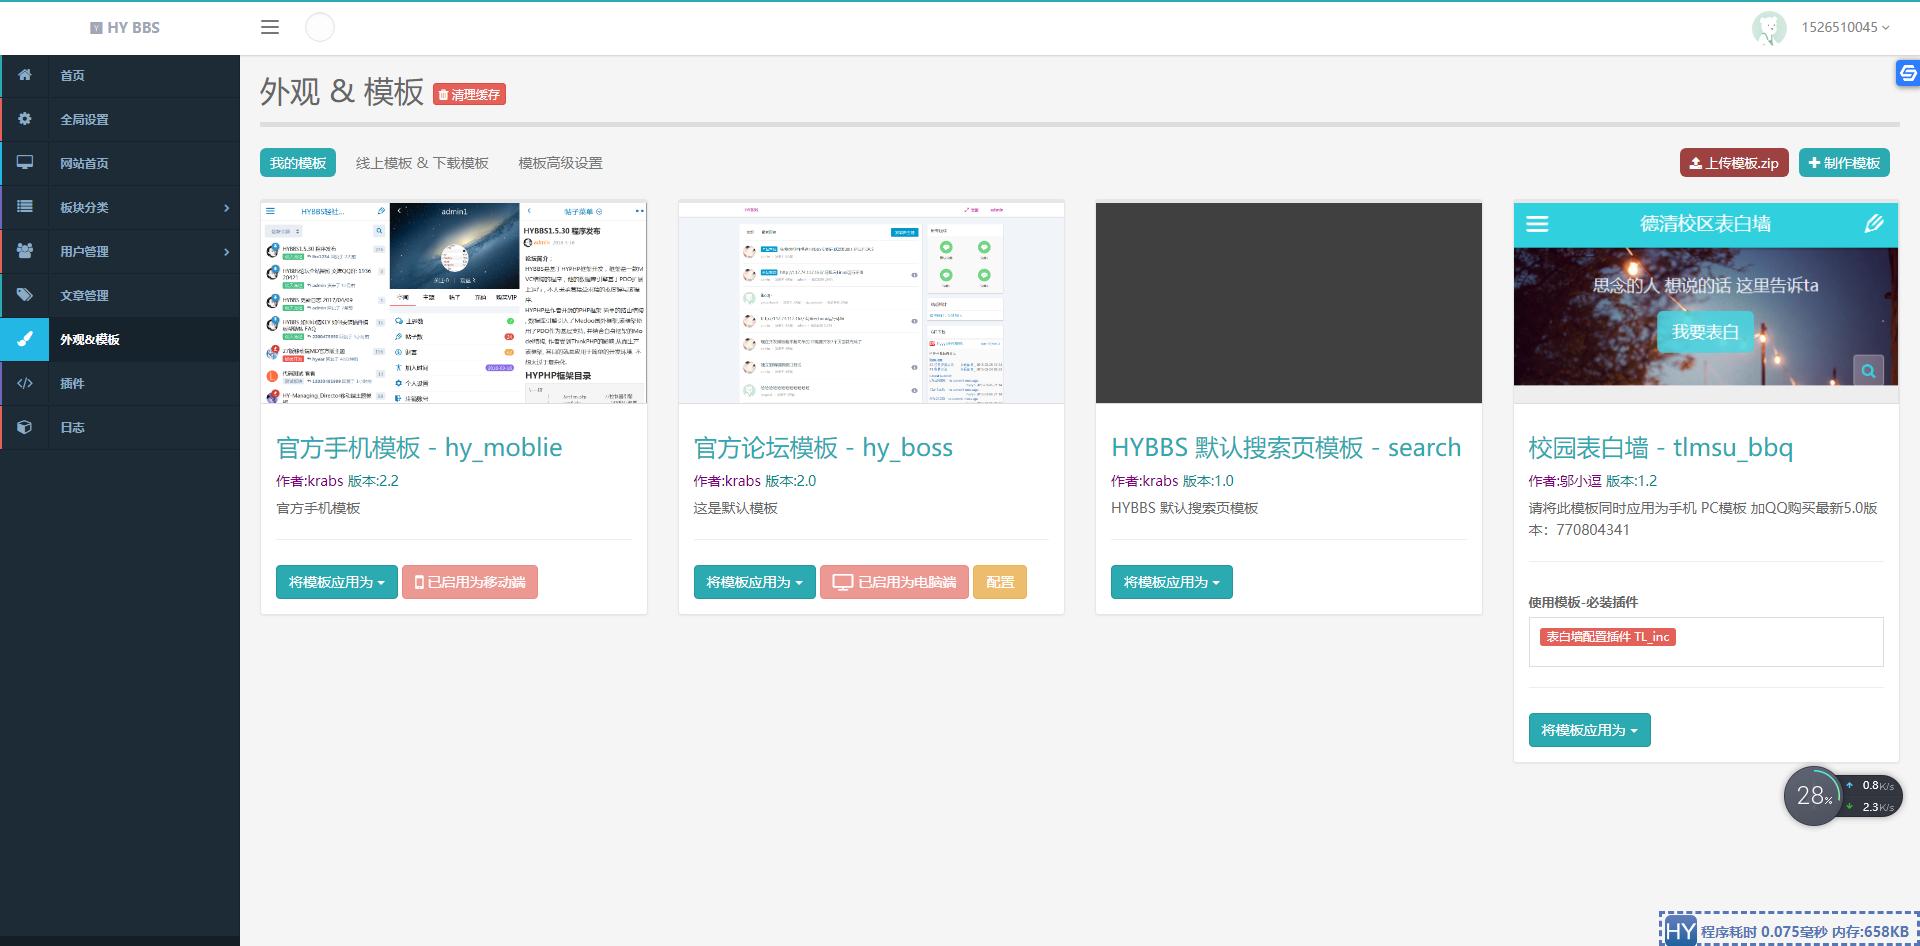 20200307000357158351063728126.png HTBBS 表白墙网站PHP程序源码  分享 HYBBS 表白墙 第3张